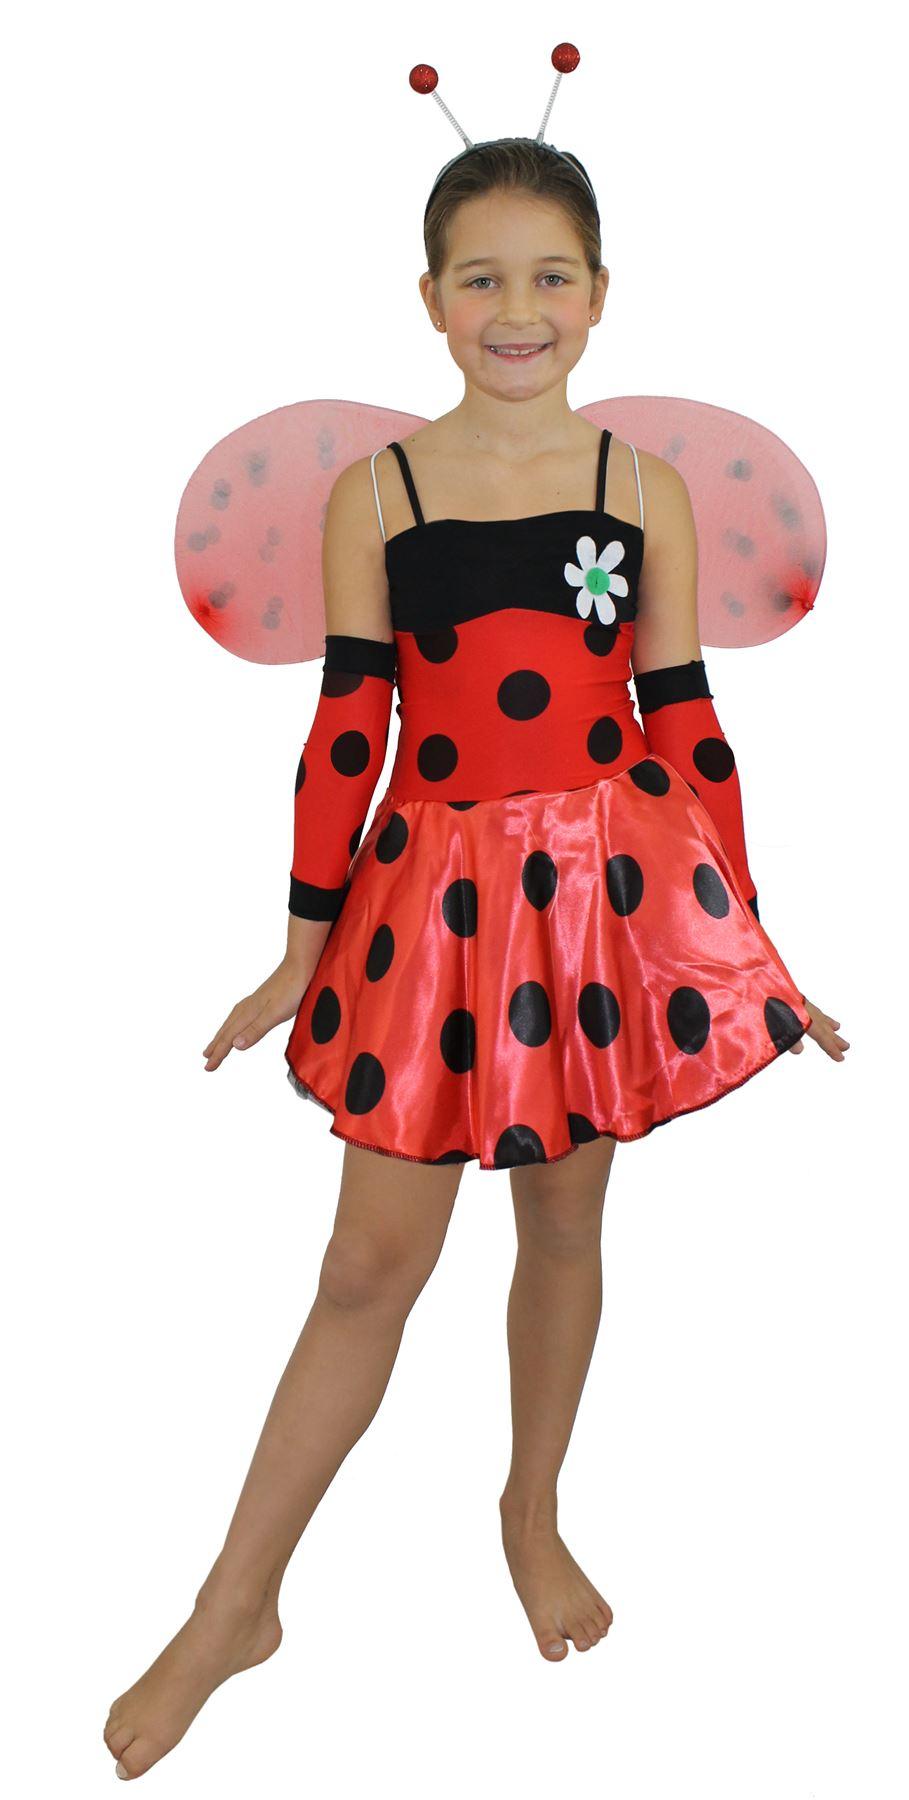 Acerca de disfraz de insecto para chica traje de mariquita para ni 209 a